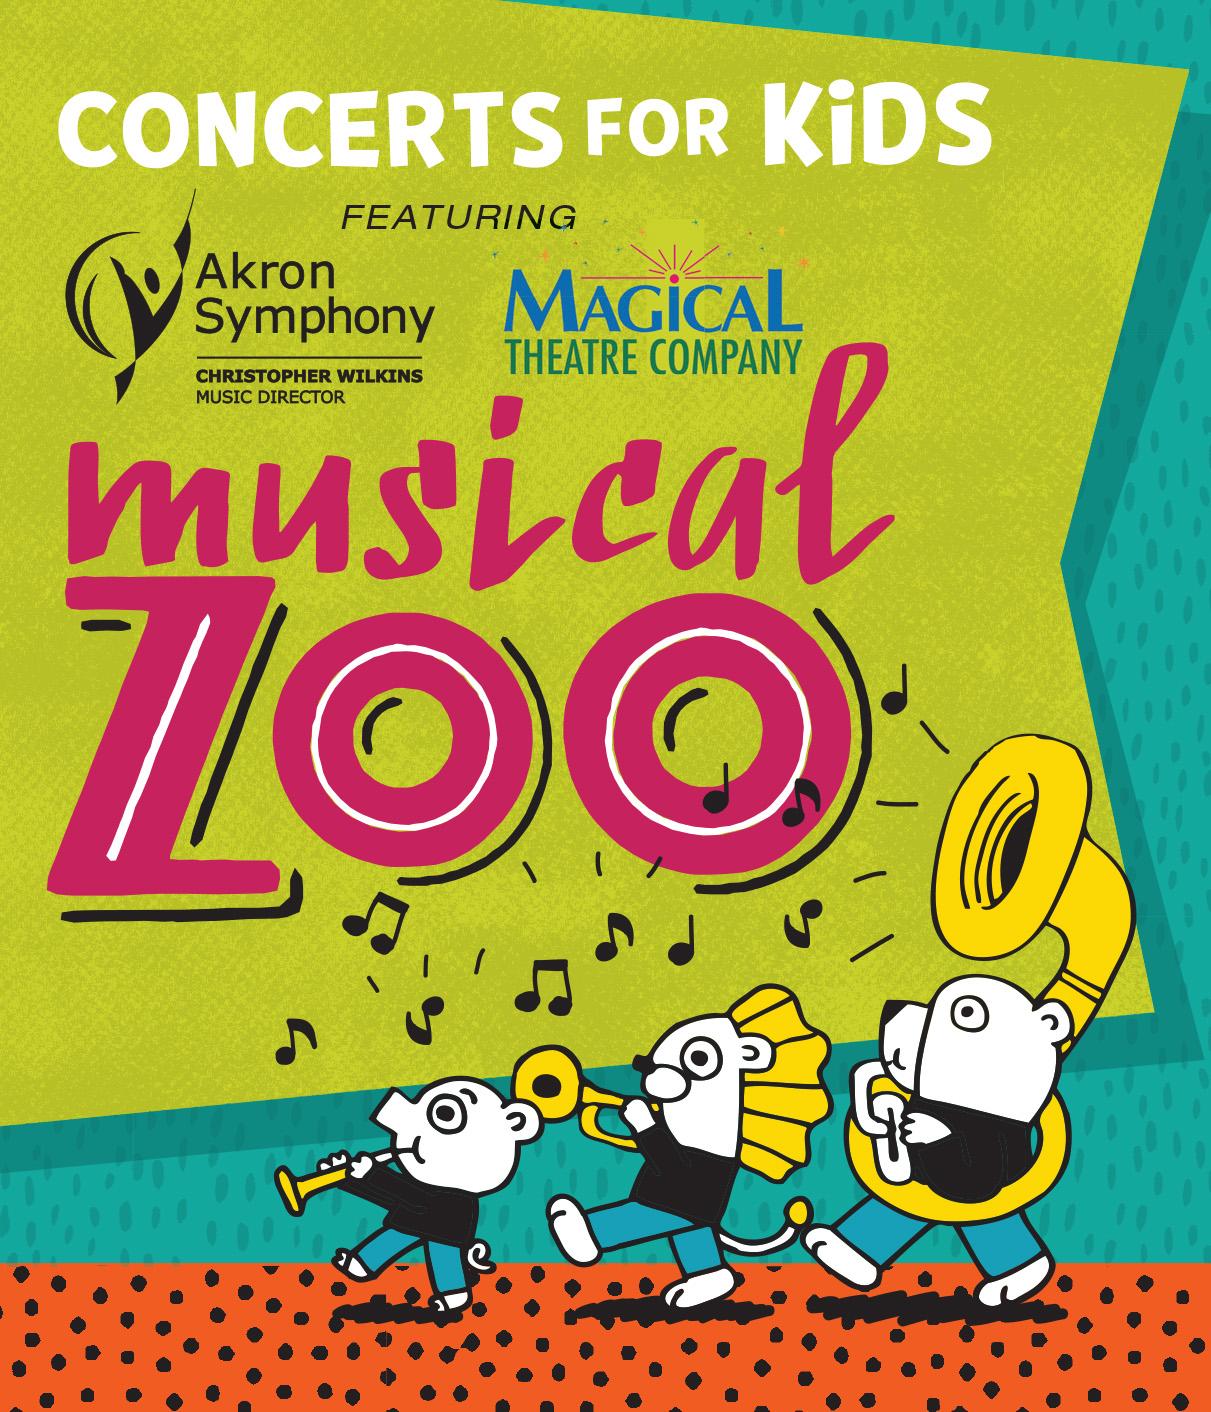 akron symphony orchestra events